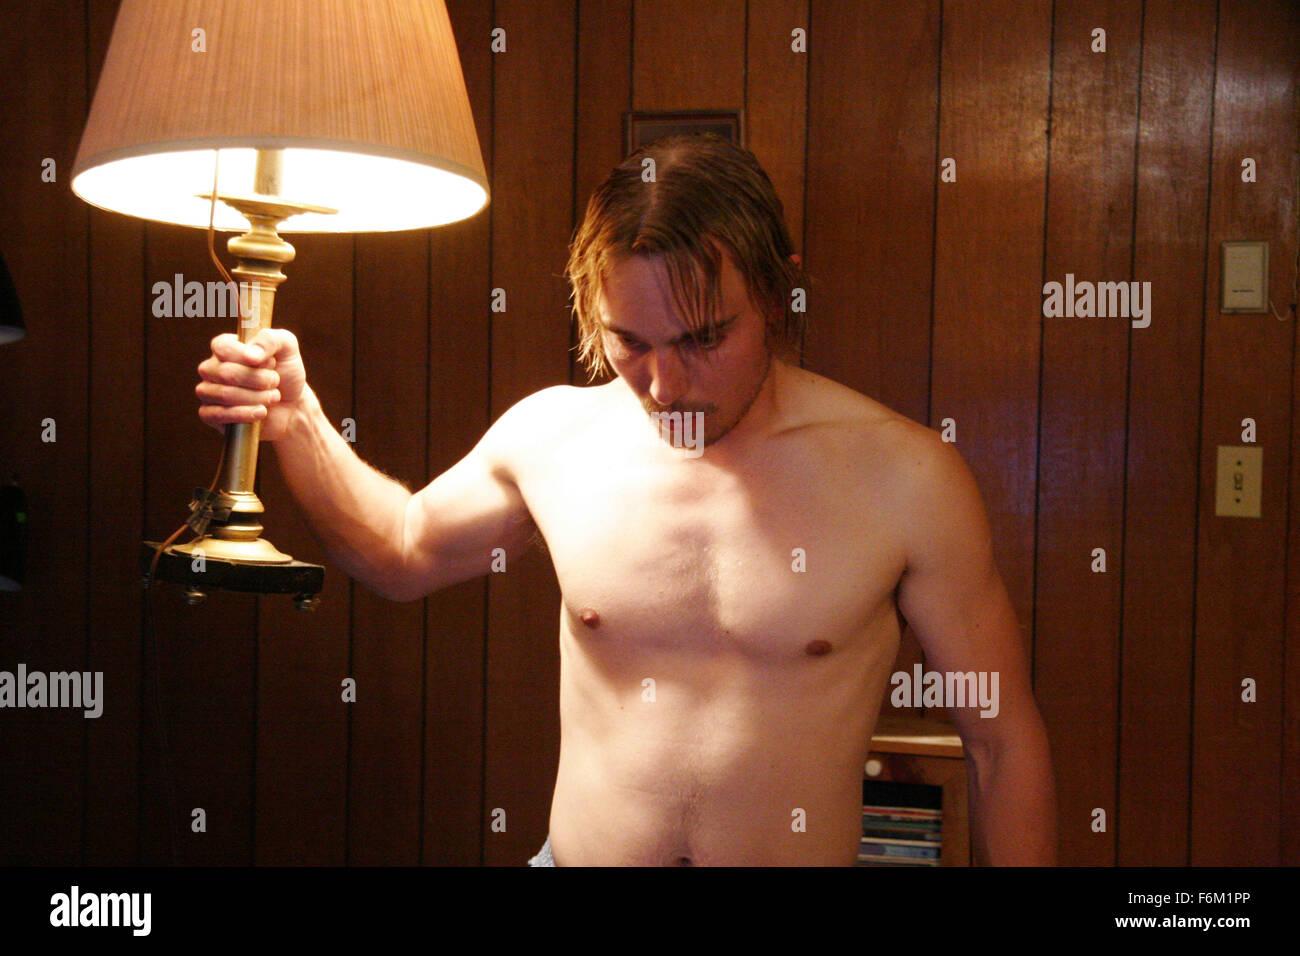 Release Date 17 June 2008 Movie Title Just Add Water Studio